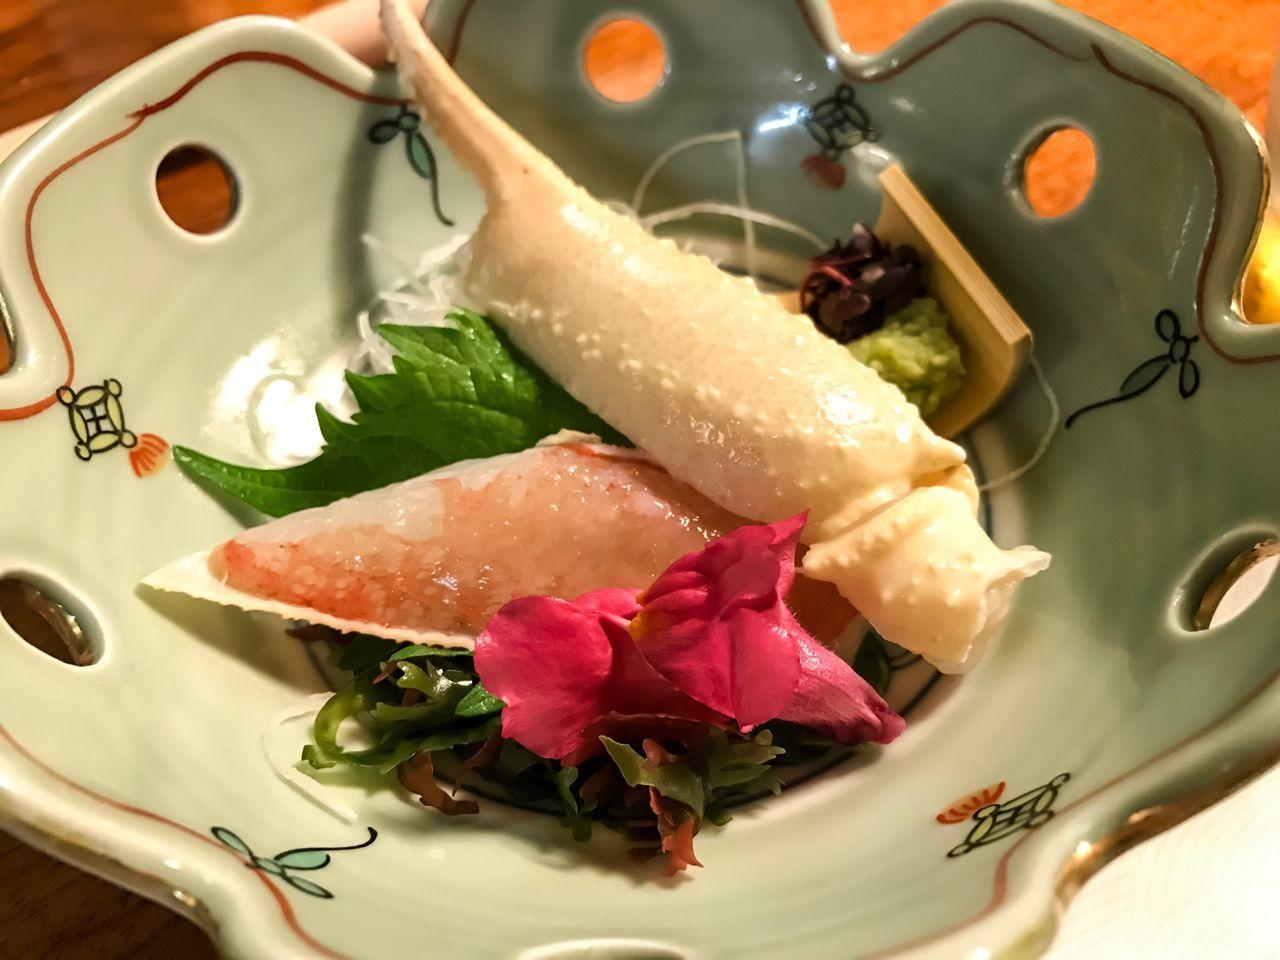 Crab Sashimi Japanese Food Japanese Crab Sashimi Dinner Sashimilovers Sashimi Dish Crab Japanese Dishes